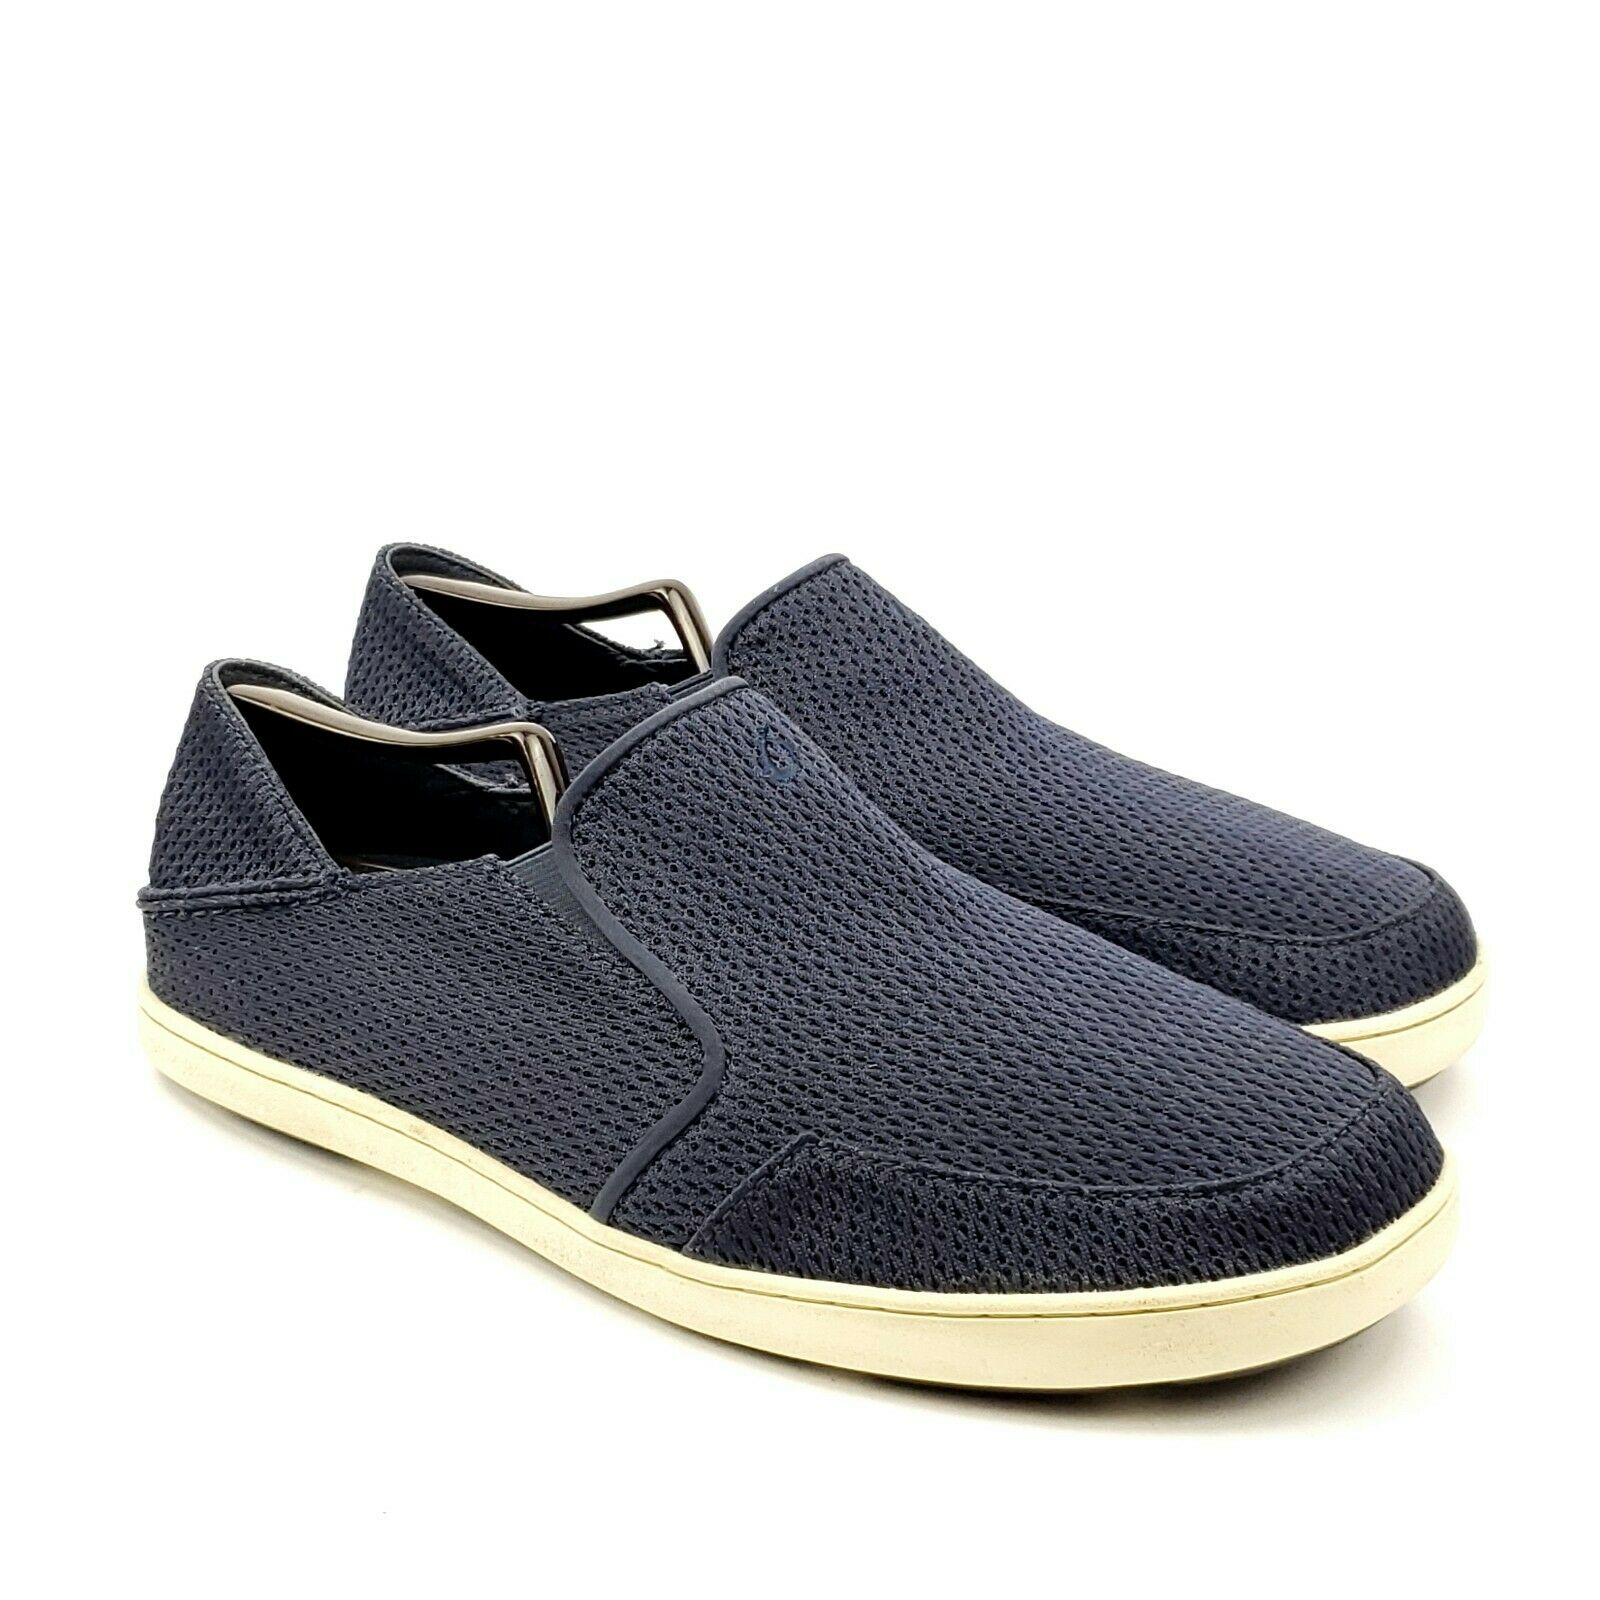 Olukai Wehi Nohea Mesh Mens Blue Slip On Boat Shoe Loafers Sz US 11 M 10426-DEDE